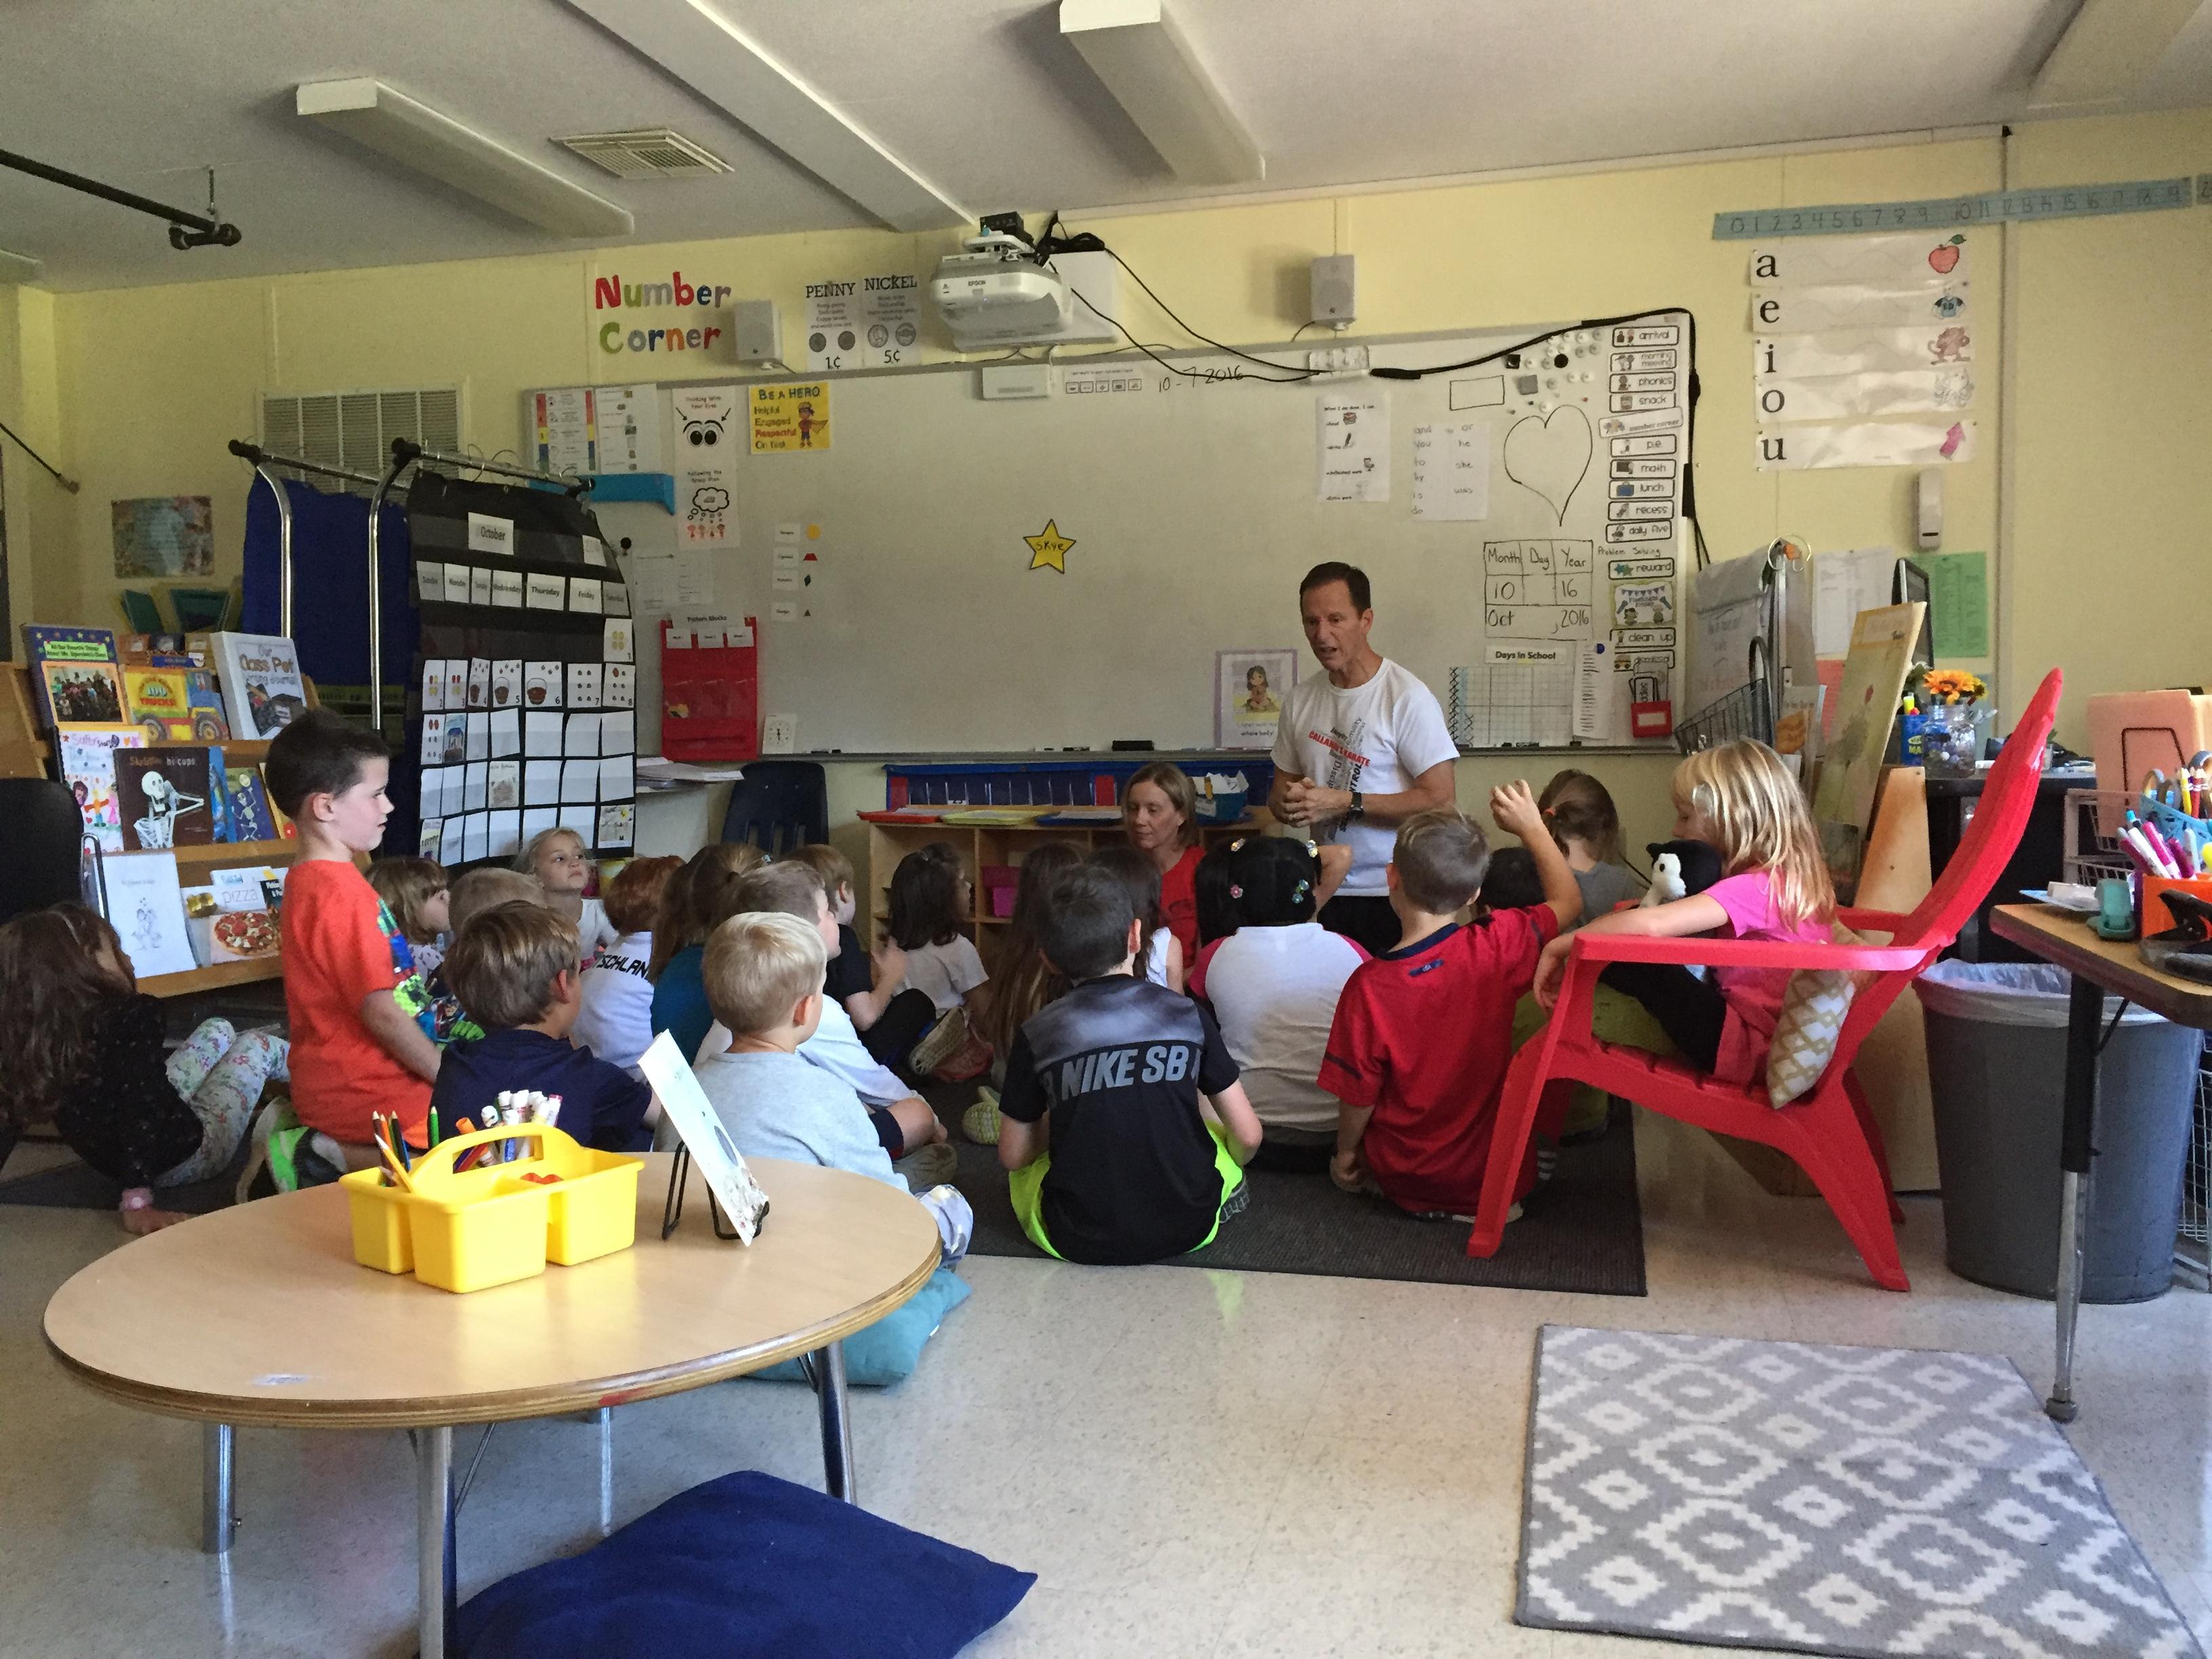 Classroom listening to Mr. Callahan speak on being good leaders.